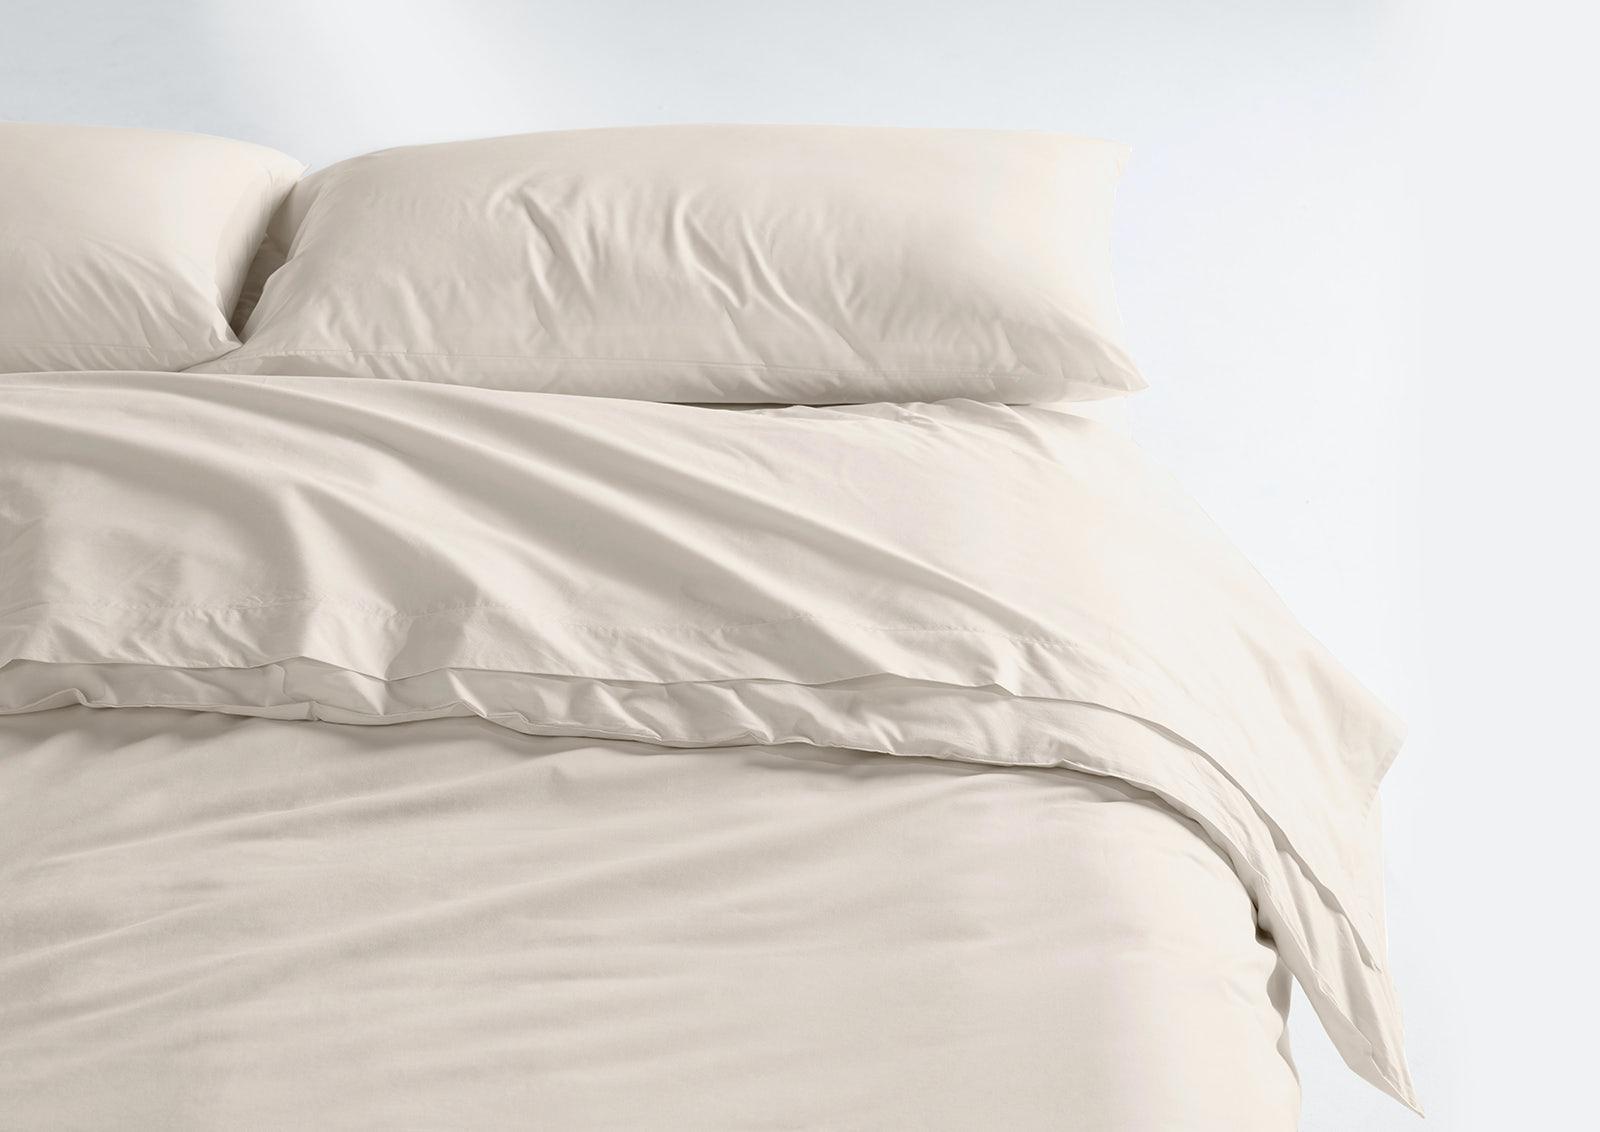 Cool Supima® Sheet Set + Duvet Cover, Cream